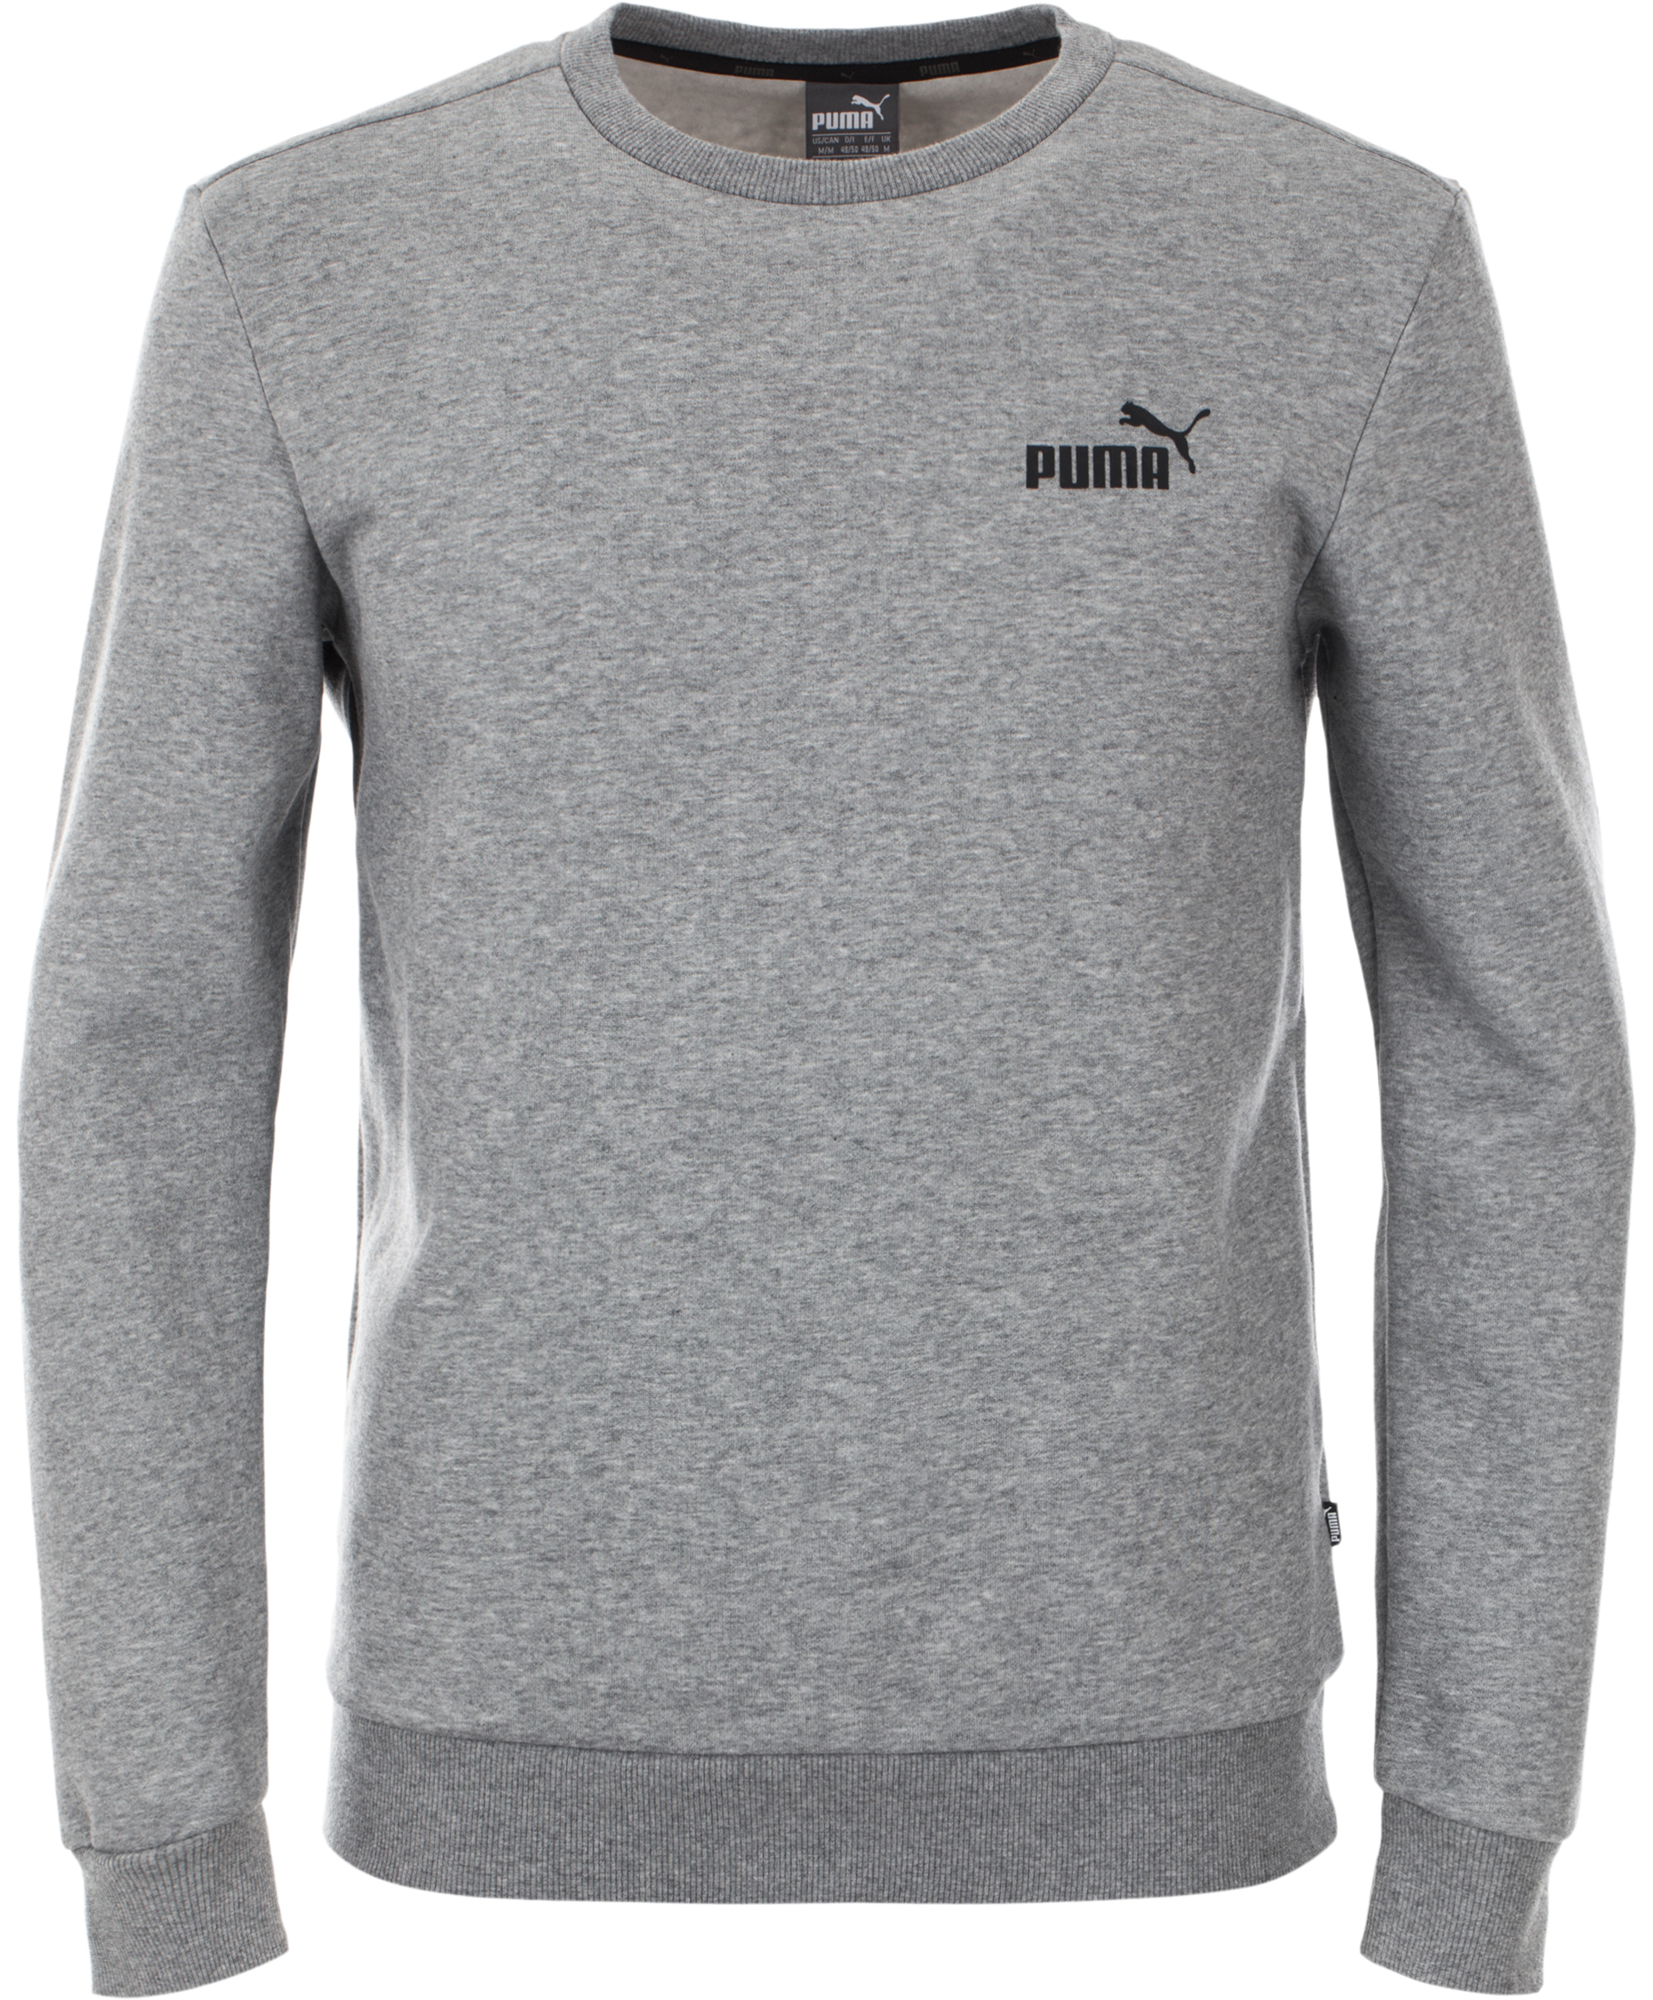 Puma Джемпер мужской Puma Ess Logo Crew, размер 50-52 цены онлайн